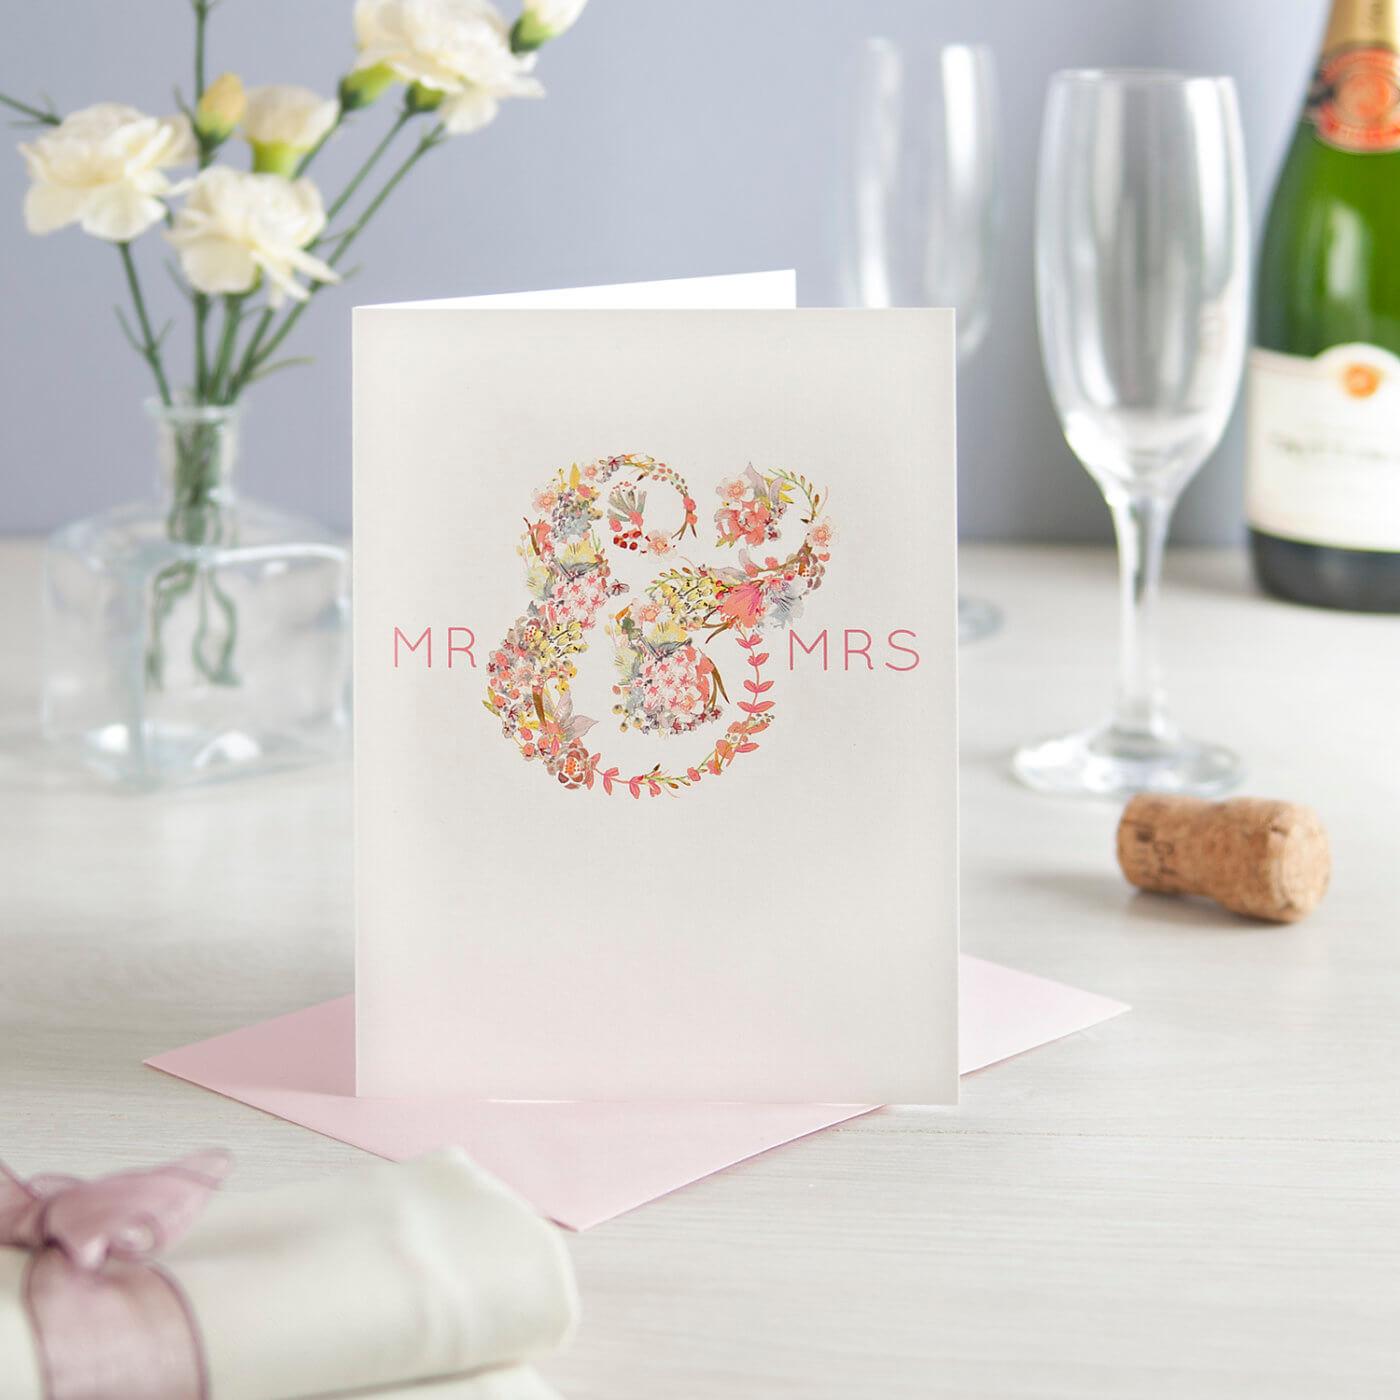 Mr & Mrs Greeting Card